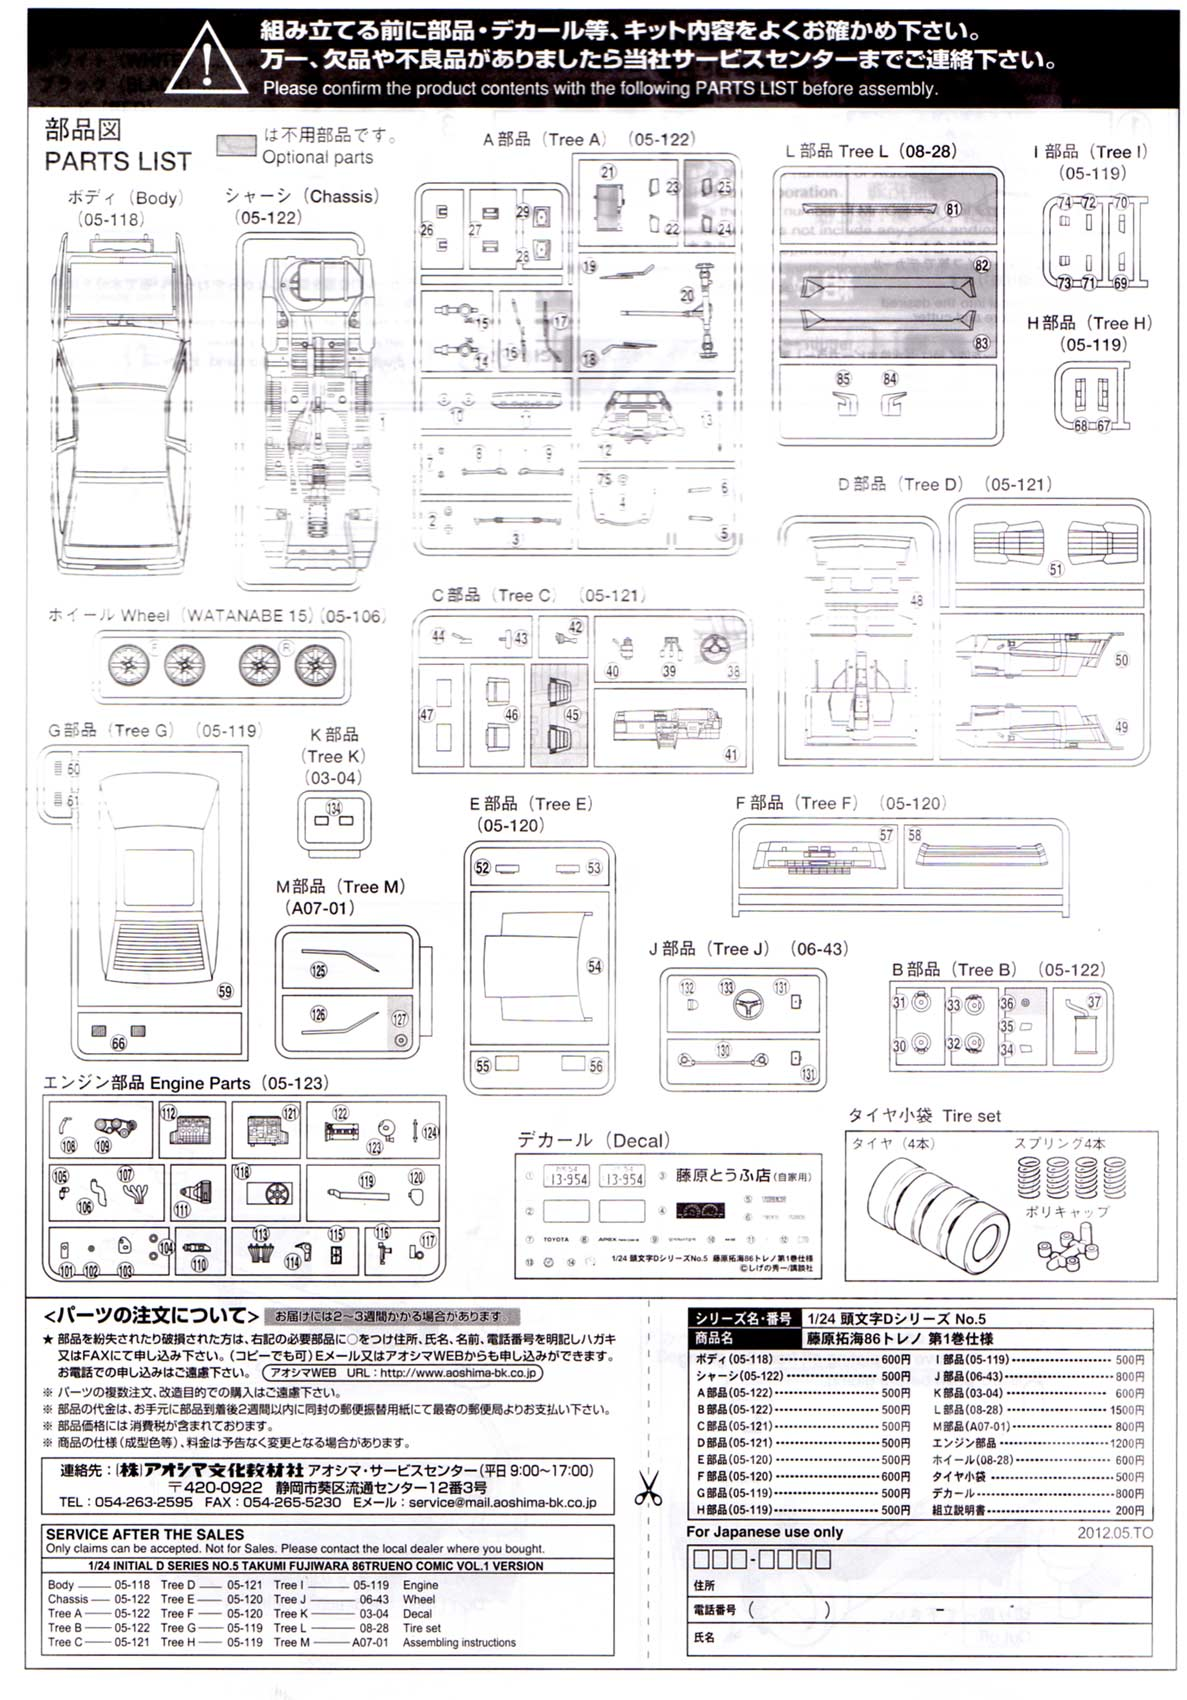 Plan de montage de la Toyota Trueno AE 86 d'Initial D - ech 1/24 (Aoshima) - Page 2